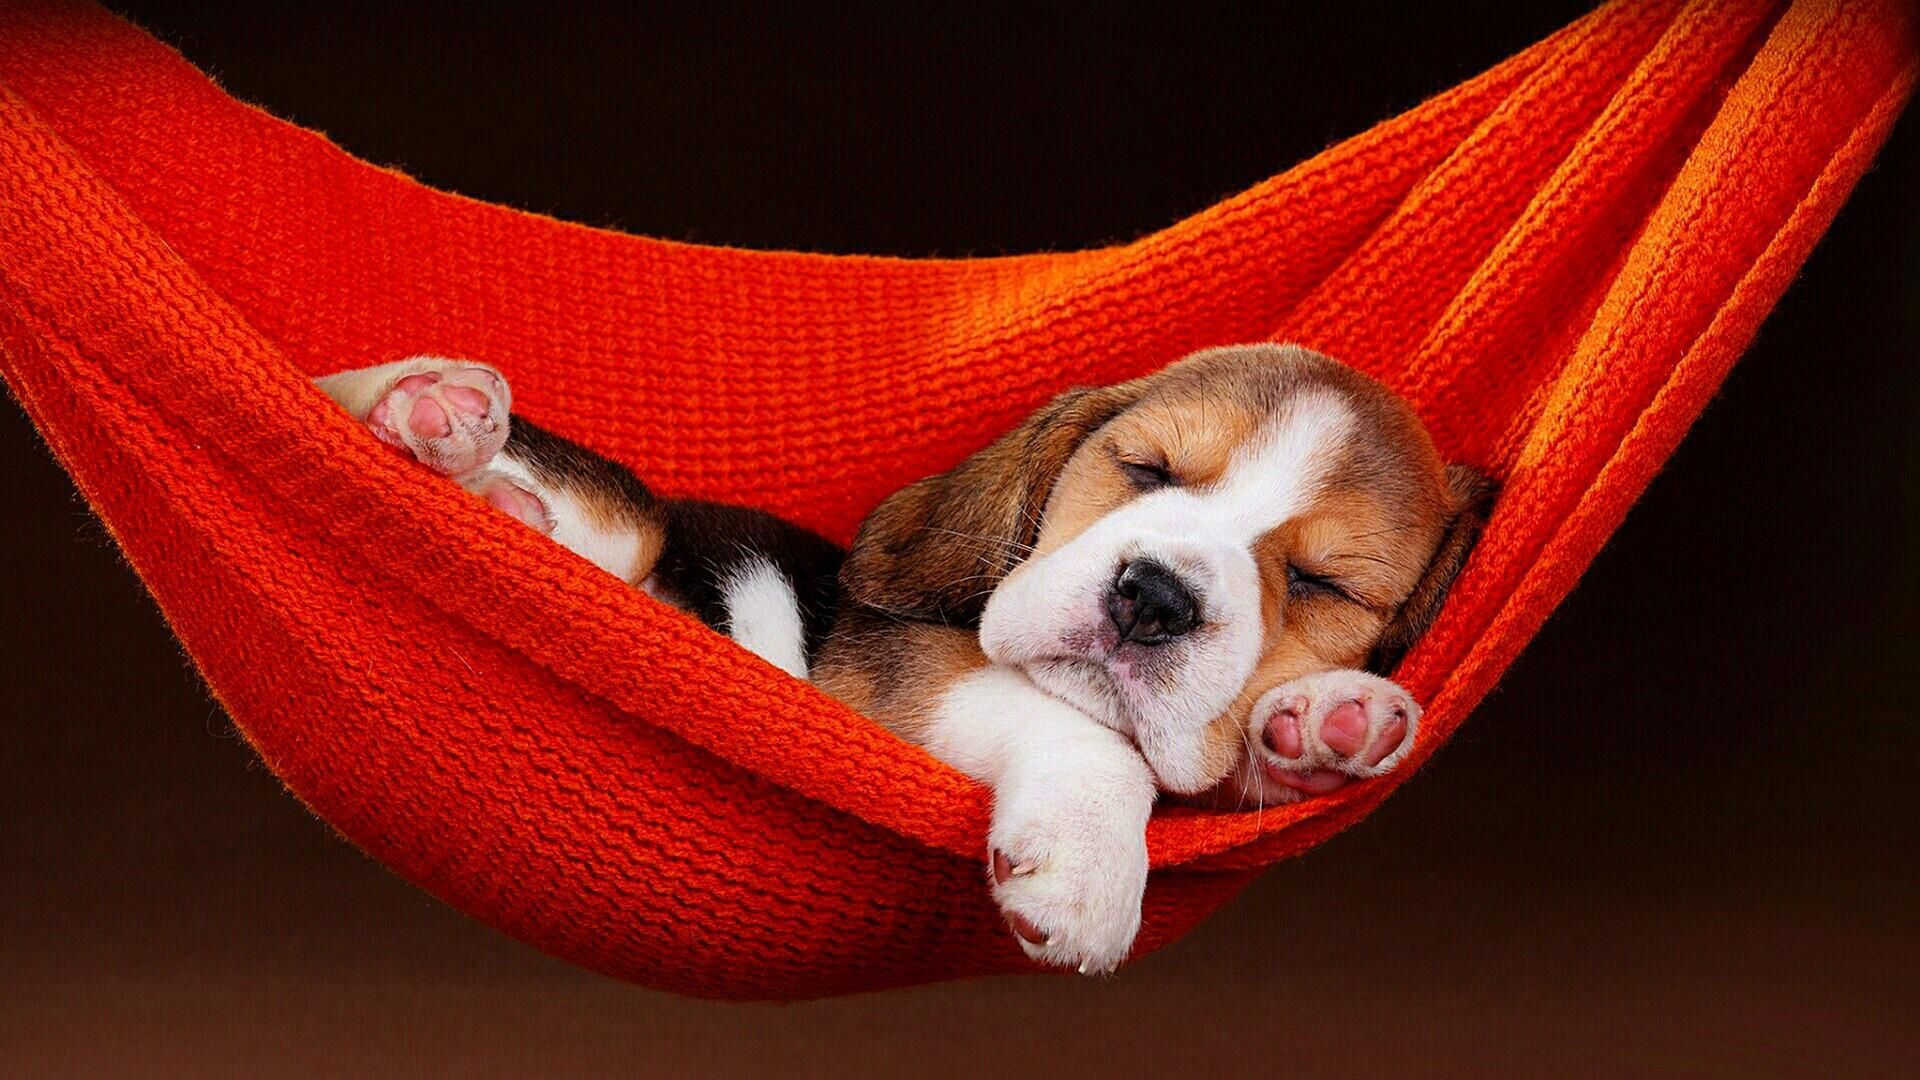 Cute Dog Wallpapers Desktop Mobile 46 Beagle Puppy Sleeping